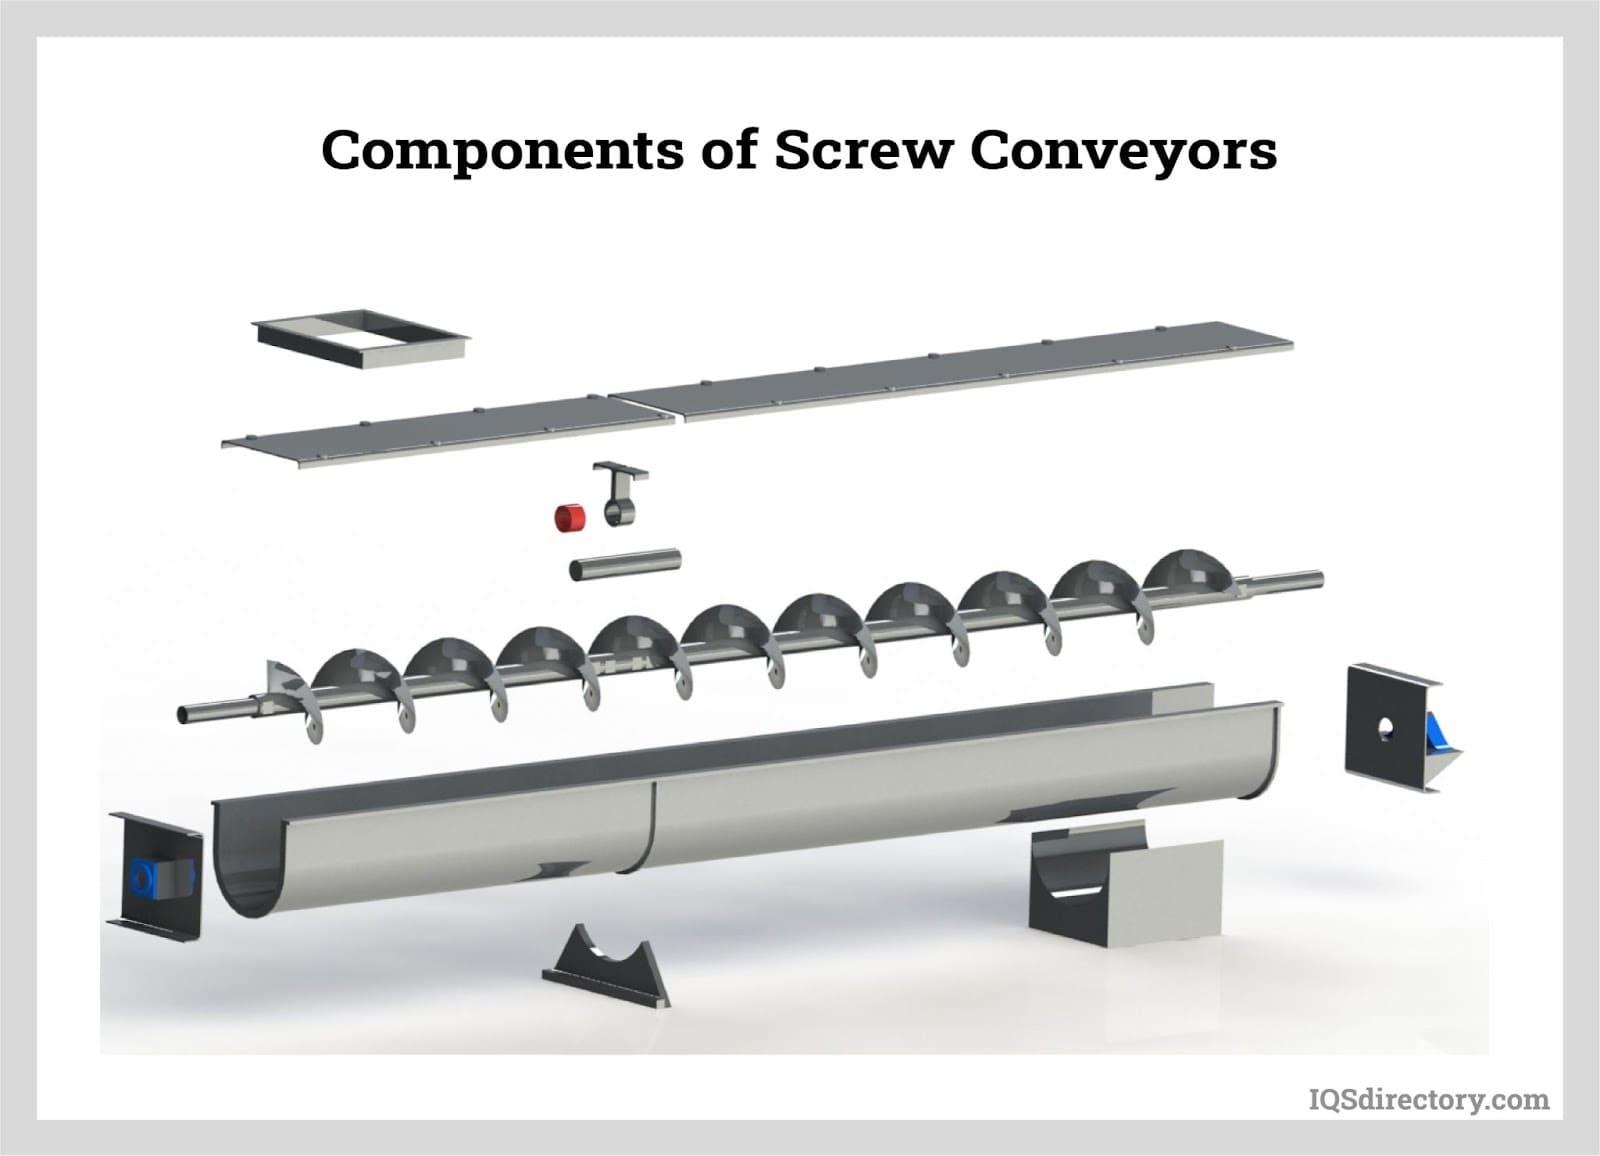 Components of Screw Conveyors